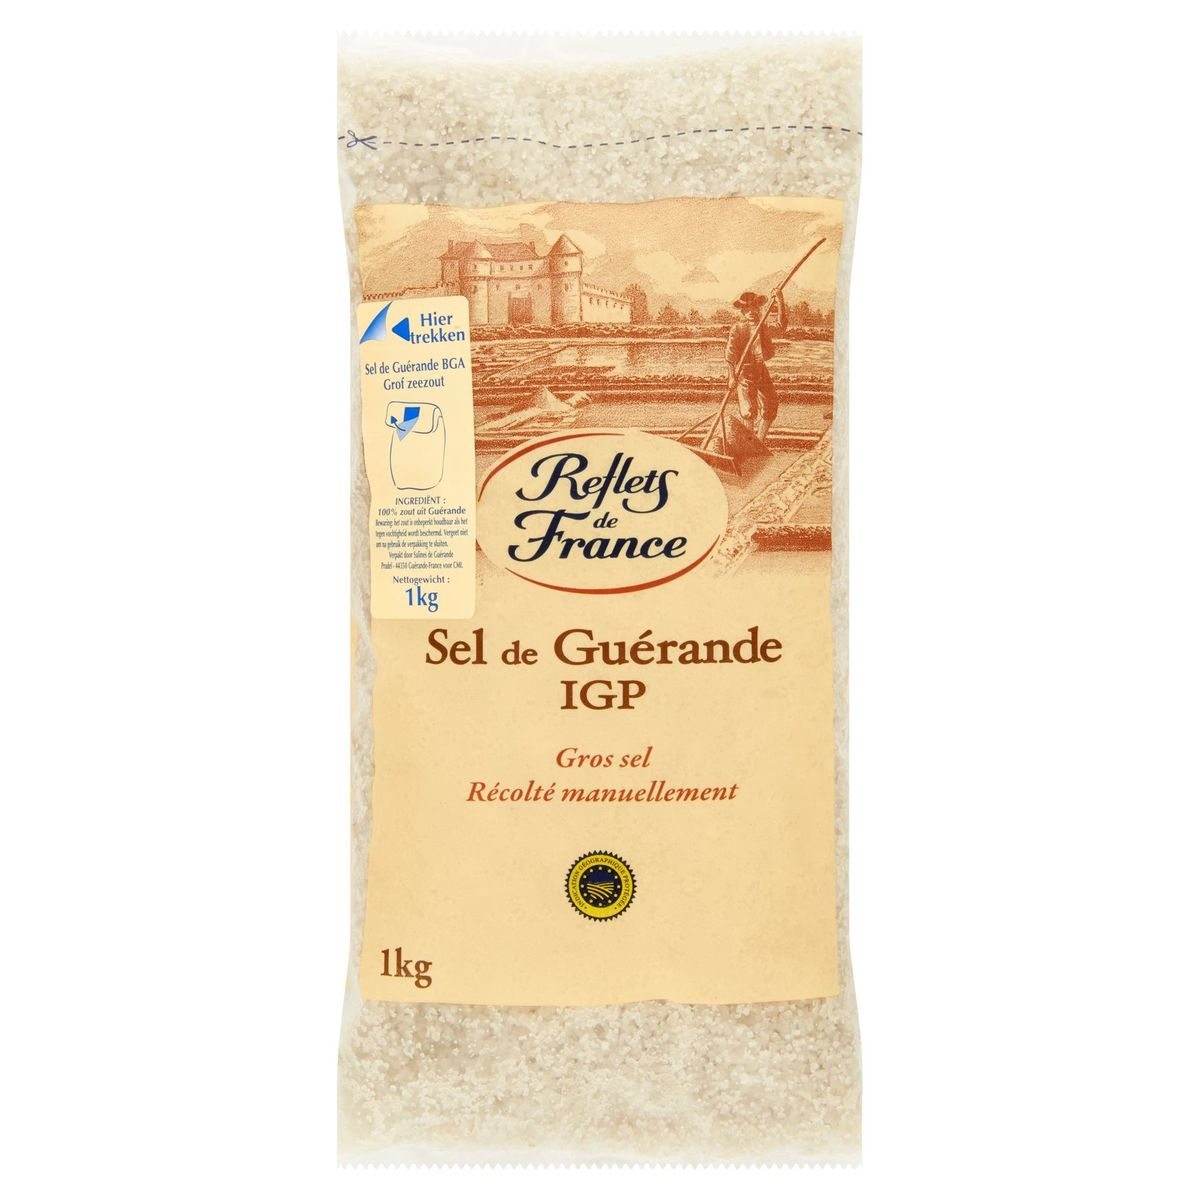 Reflets de France Sel de Guérande IGP Gros Sel 1 kg